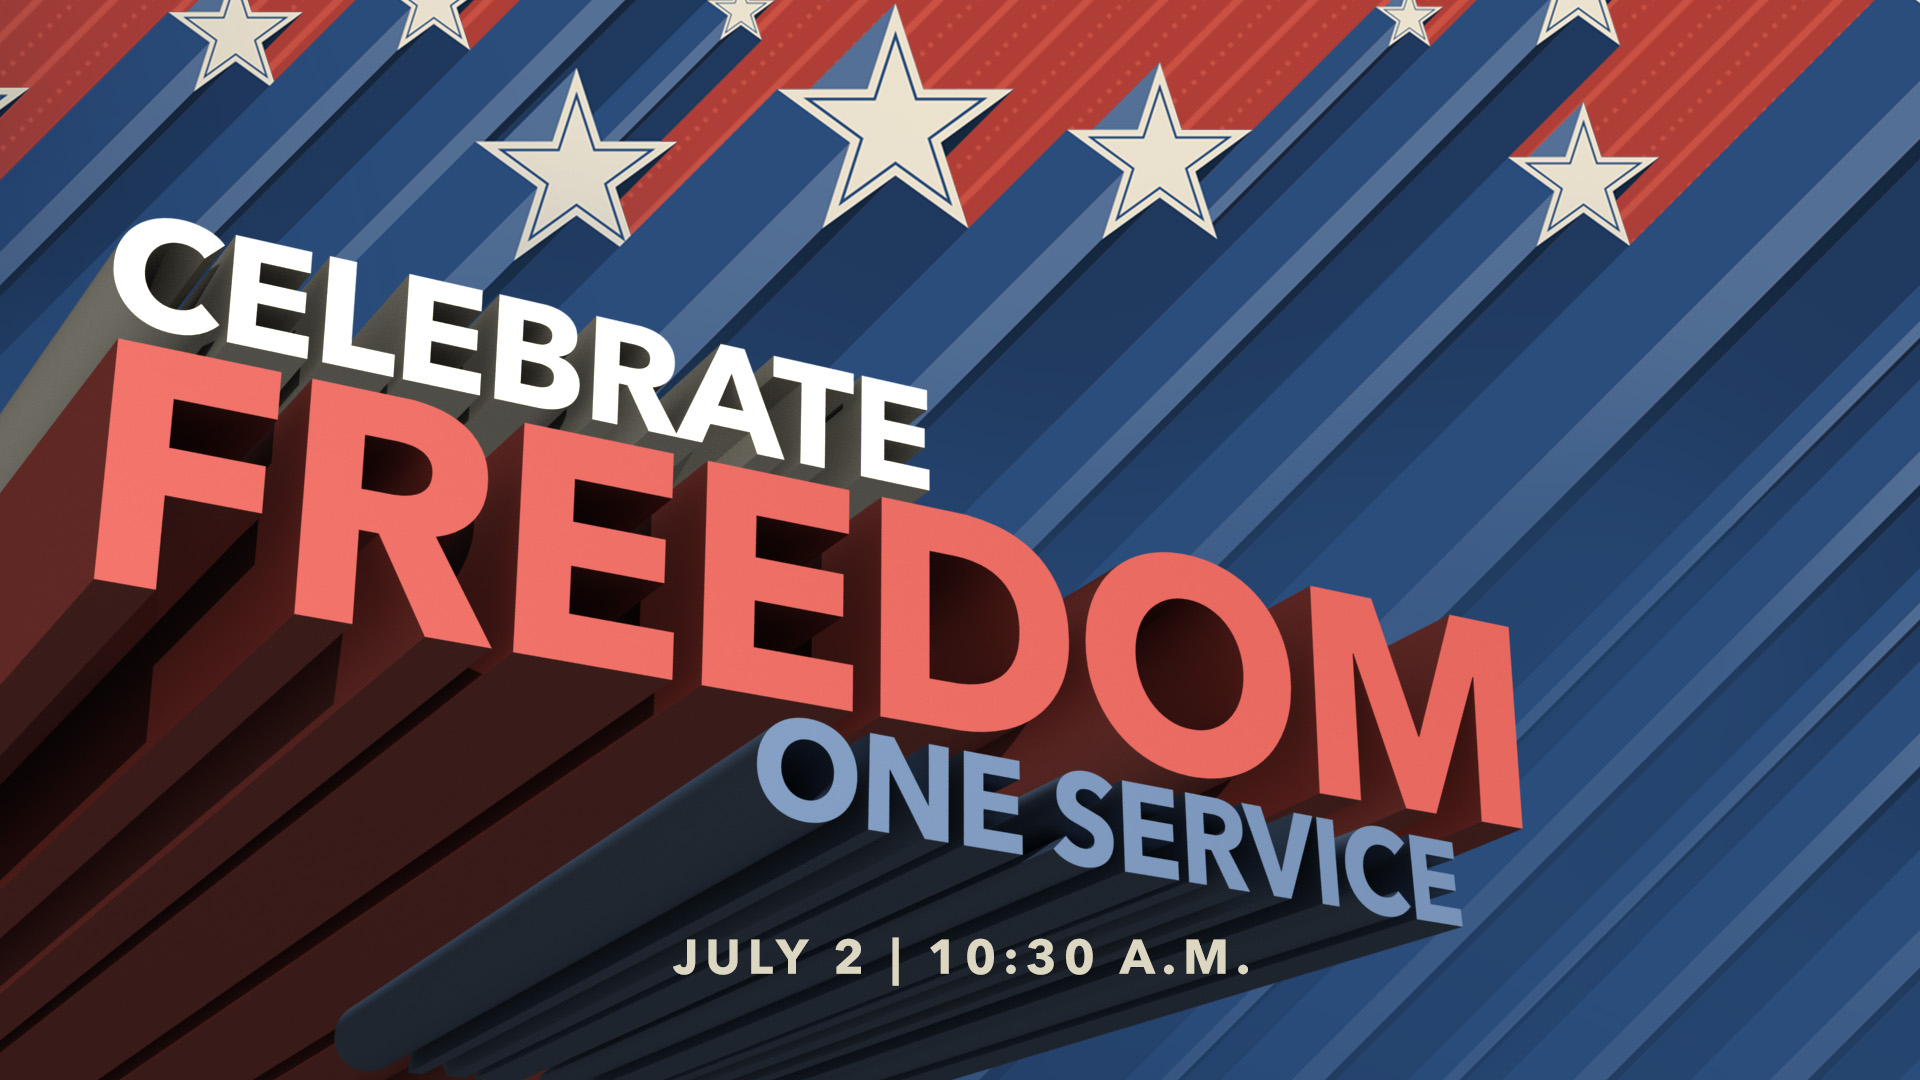 celebrate-freedom-1080